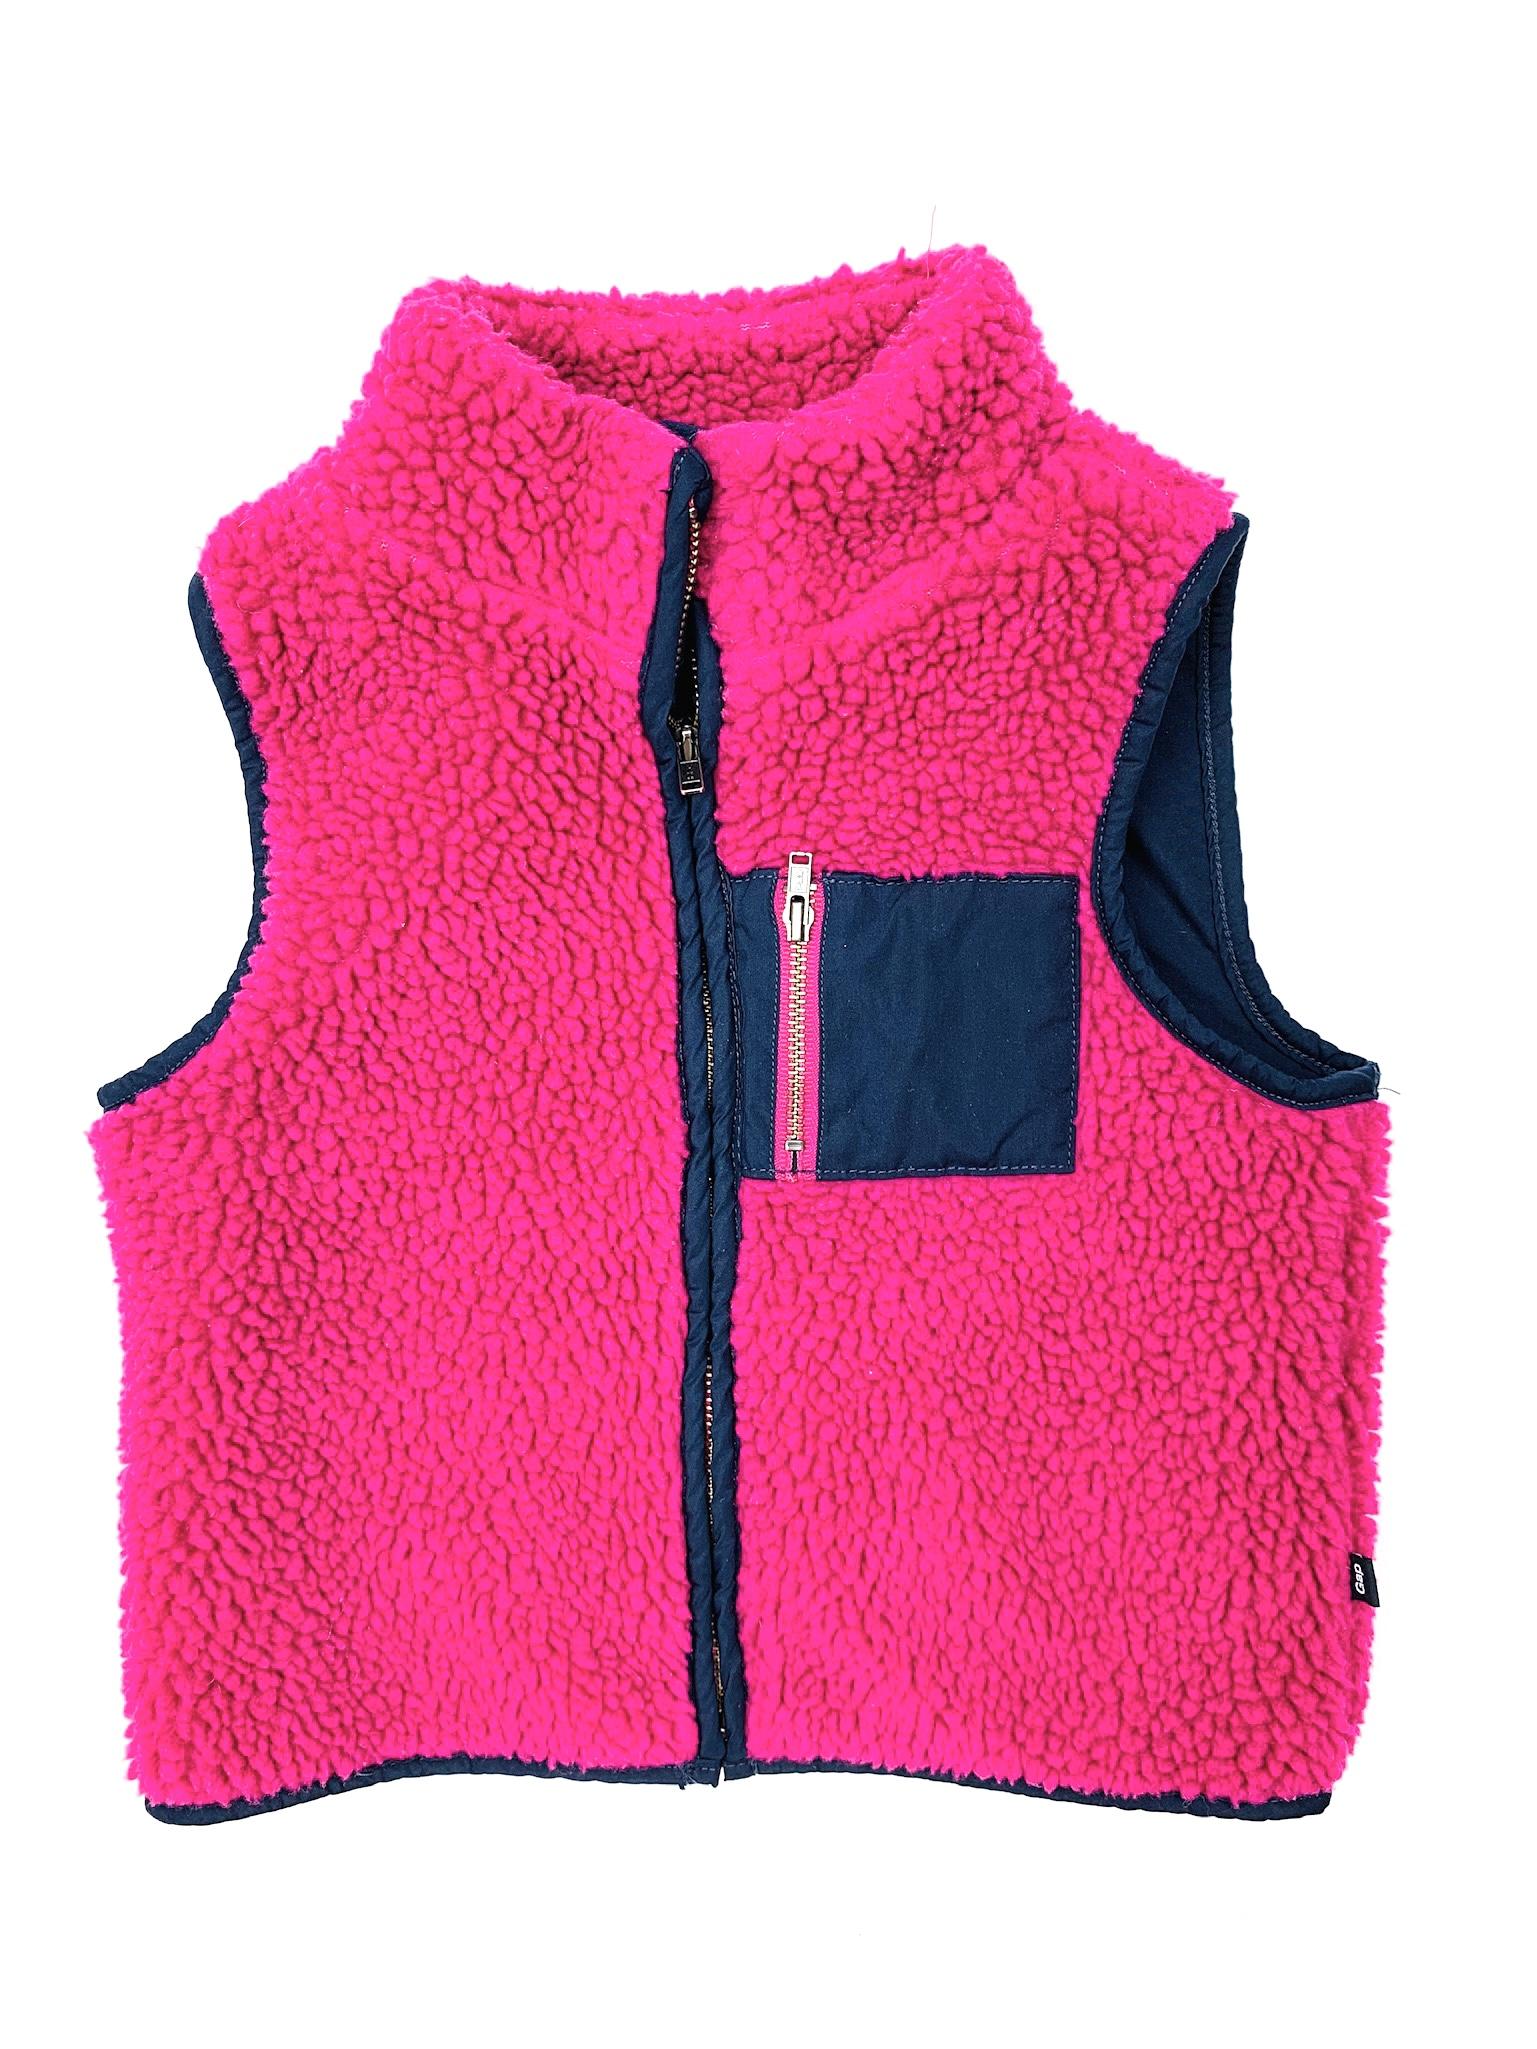 Gap Baby  3T Outerwear